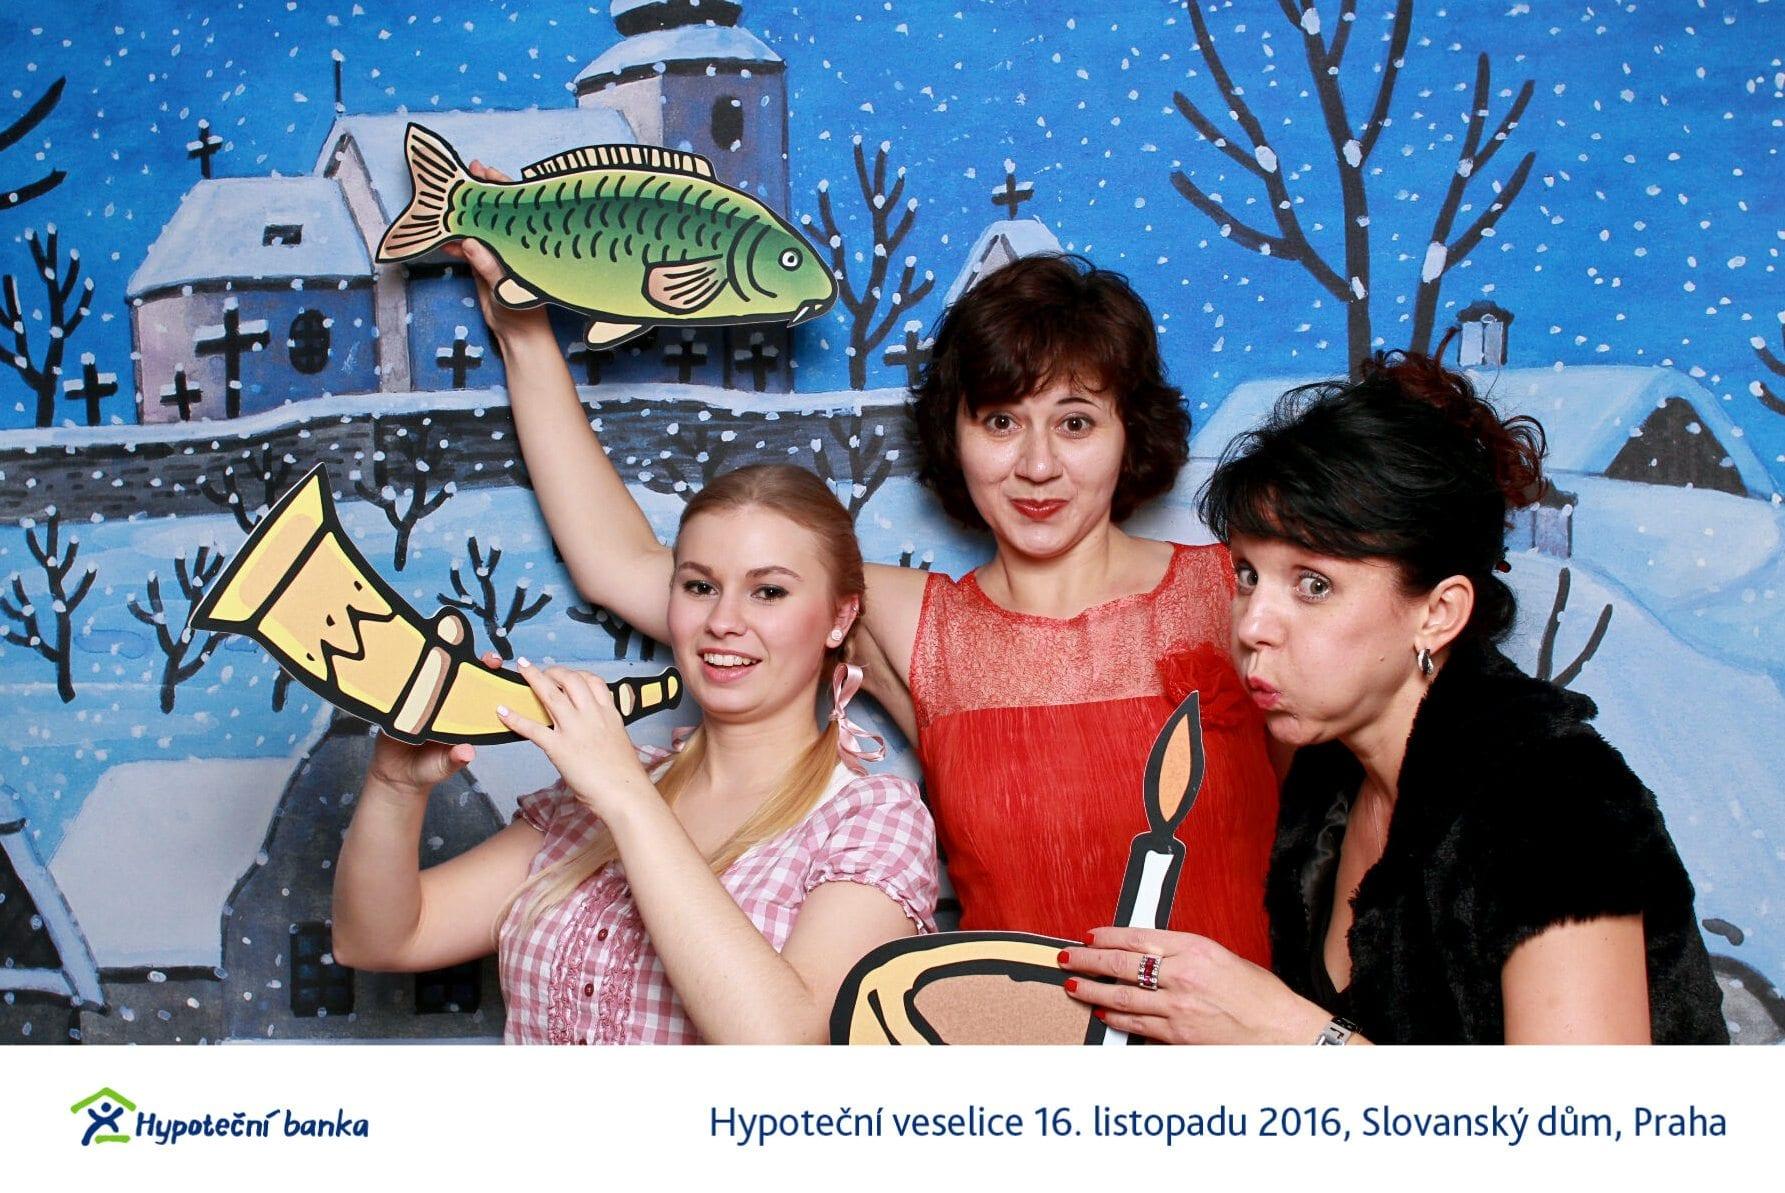 fotokoutek-hypotecni-veselice-16-11-2016-159031